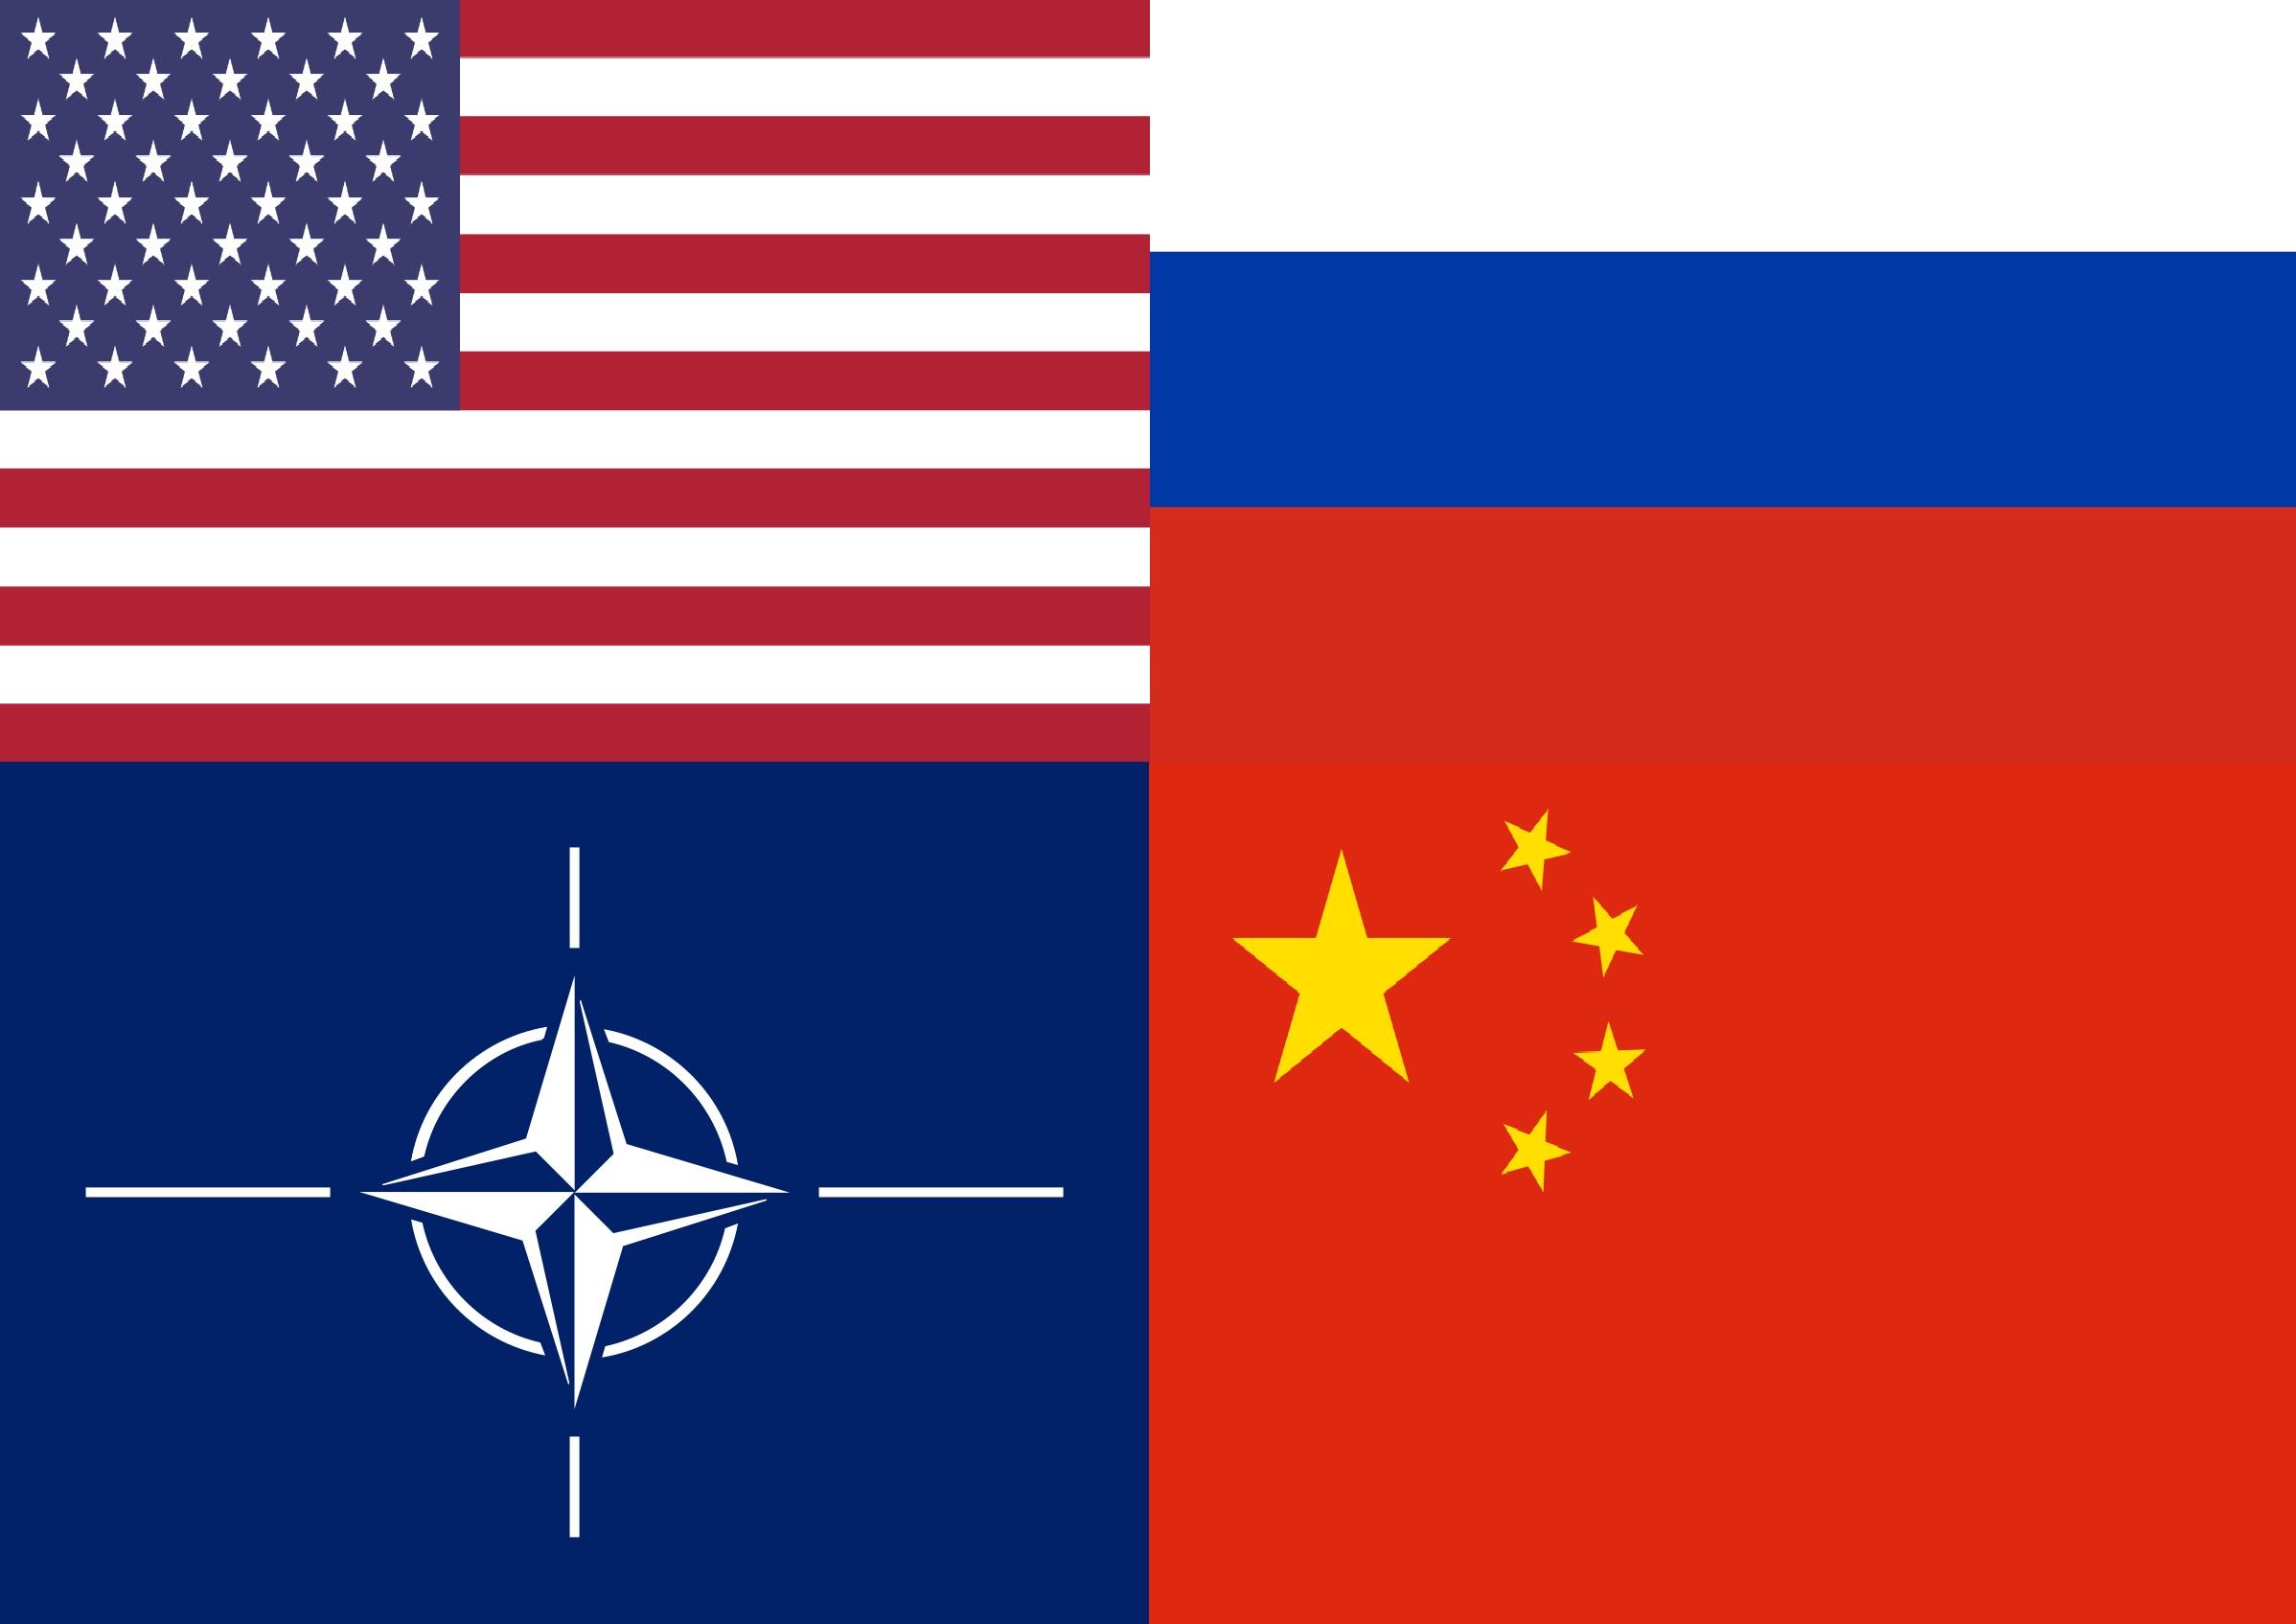 USA EE.UU. CHINA RUSIA OTAN